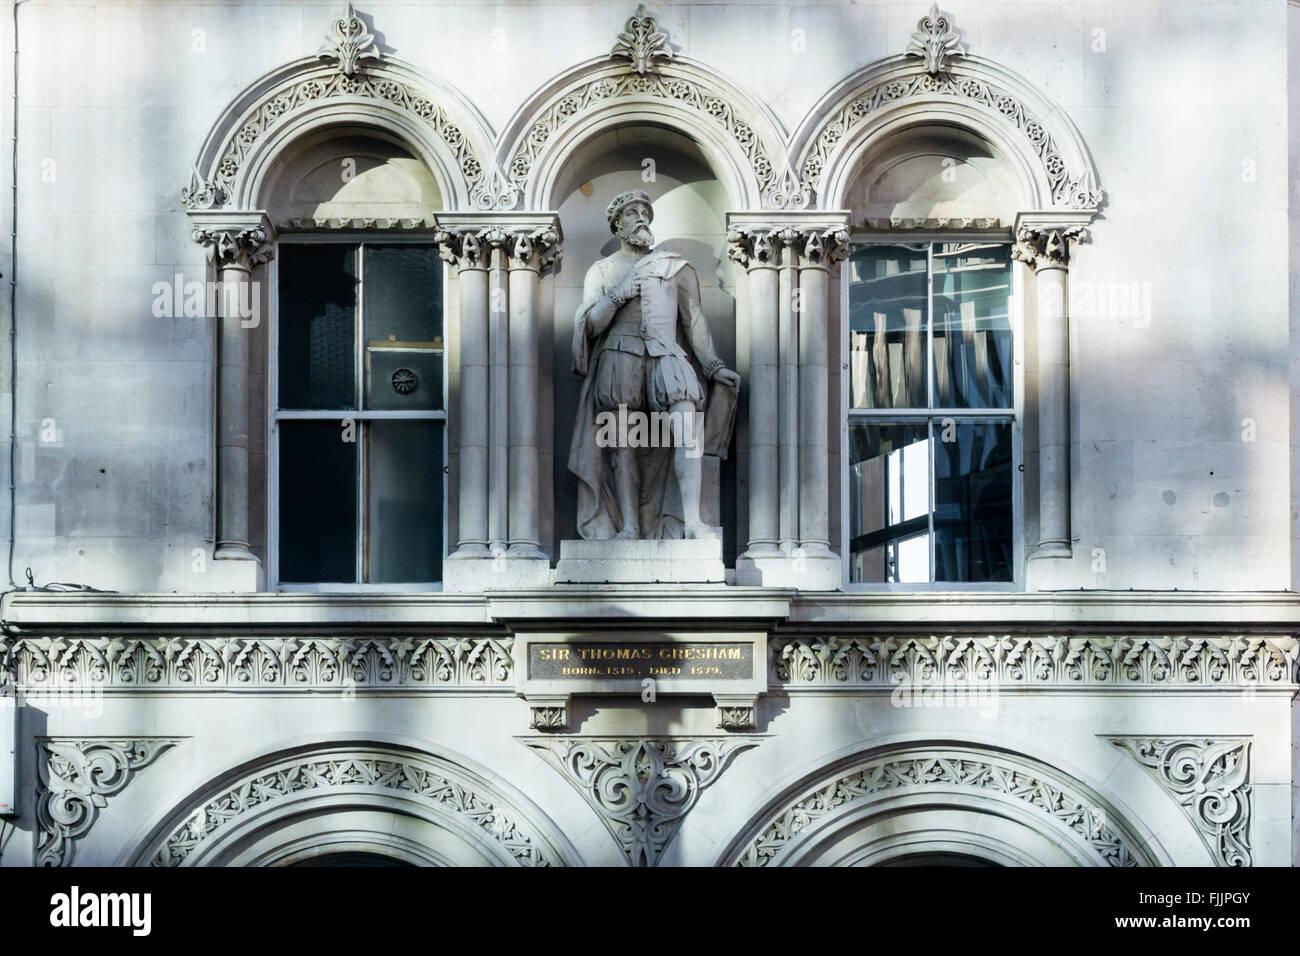 Statue of Sir Thomas Gresham on building at Holborn Viaduct, London. Stock Photo